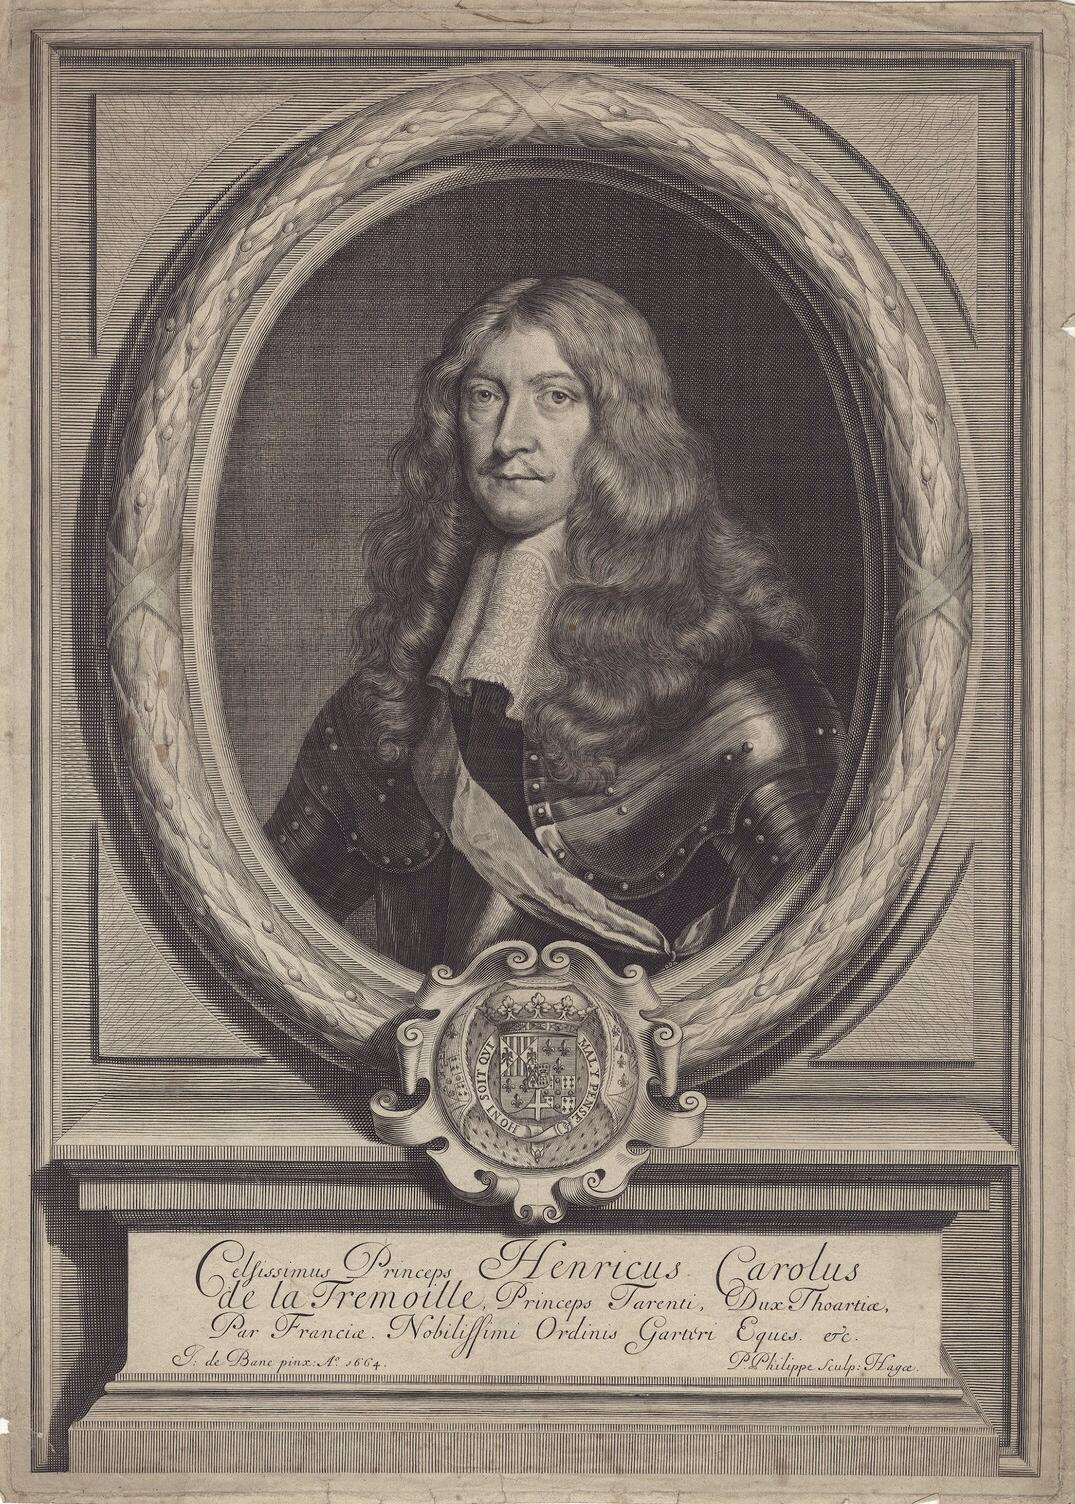 Henri Charles de La Trémoille - Anführer der Fronde